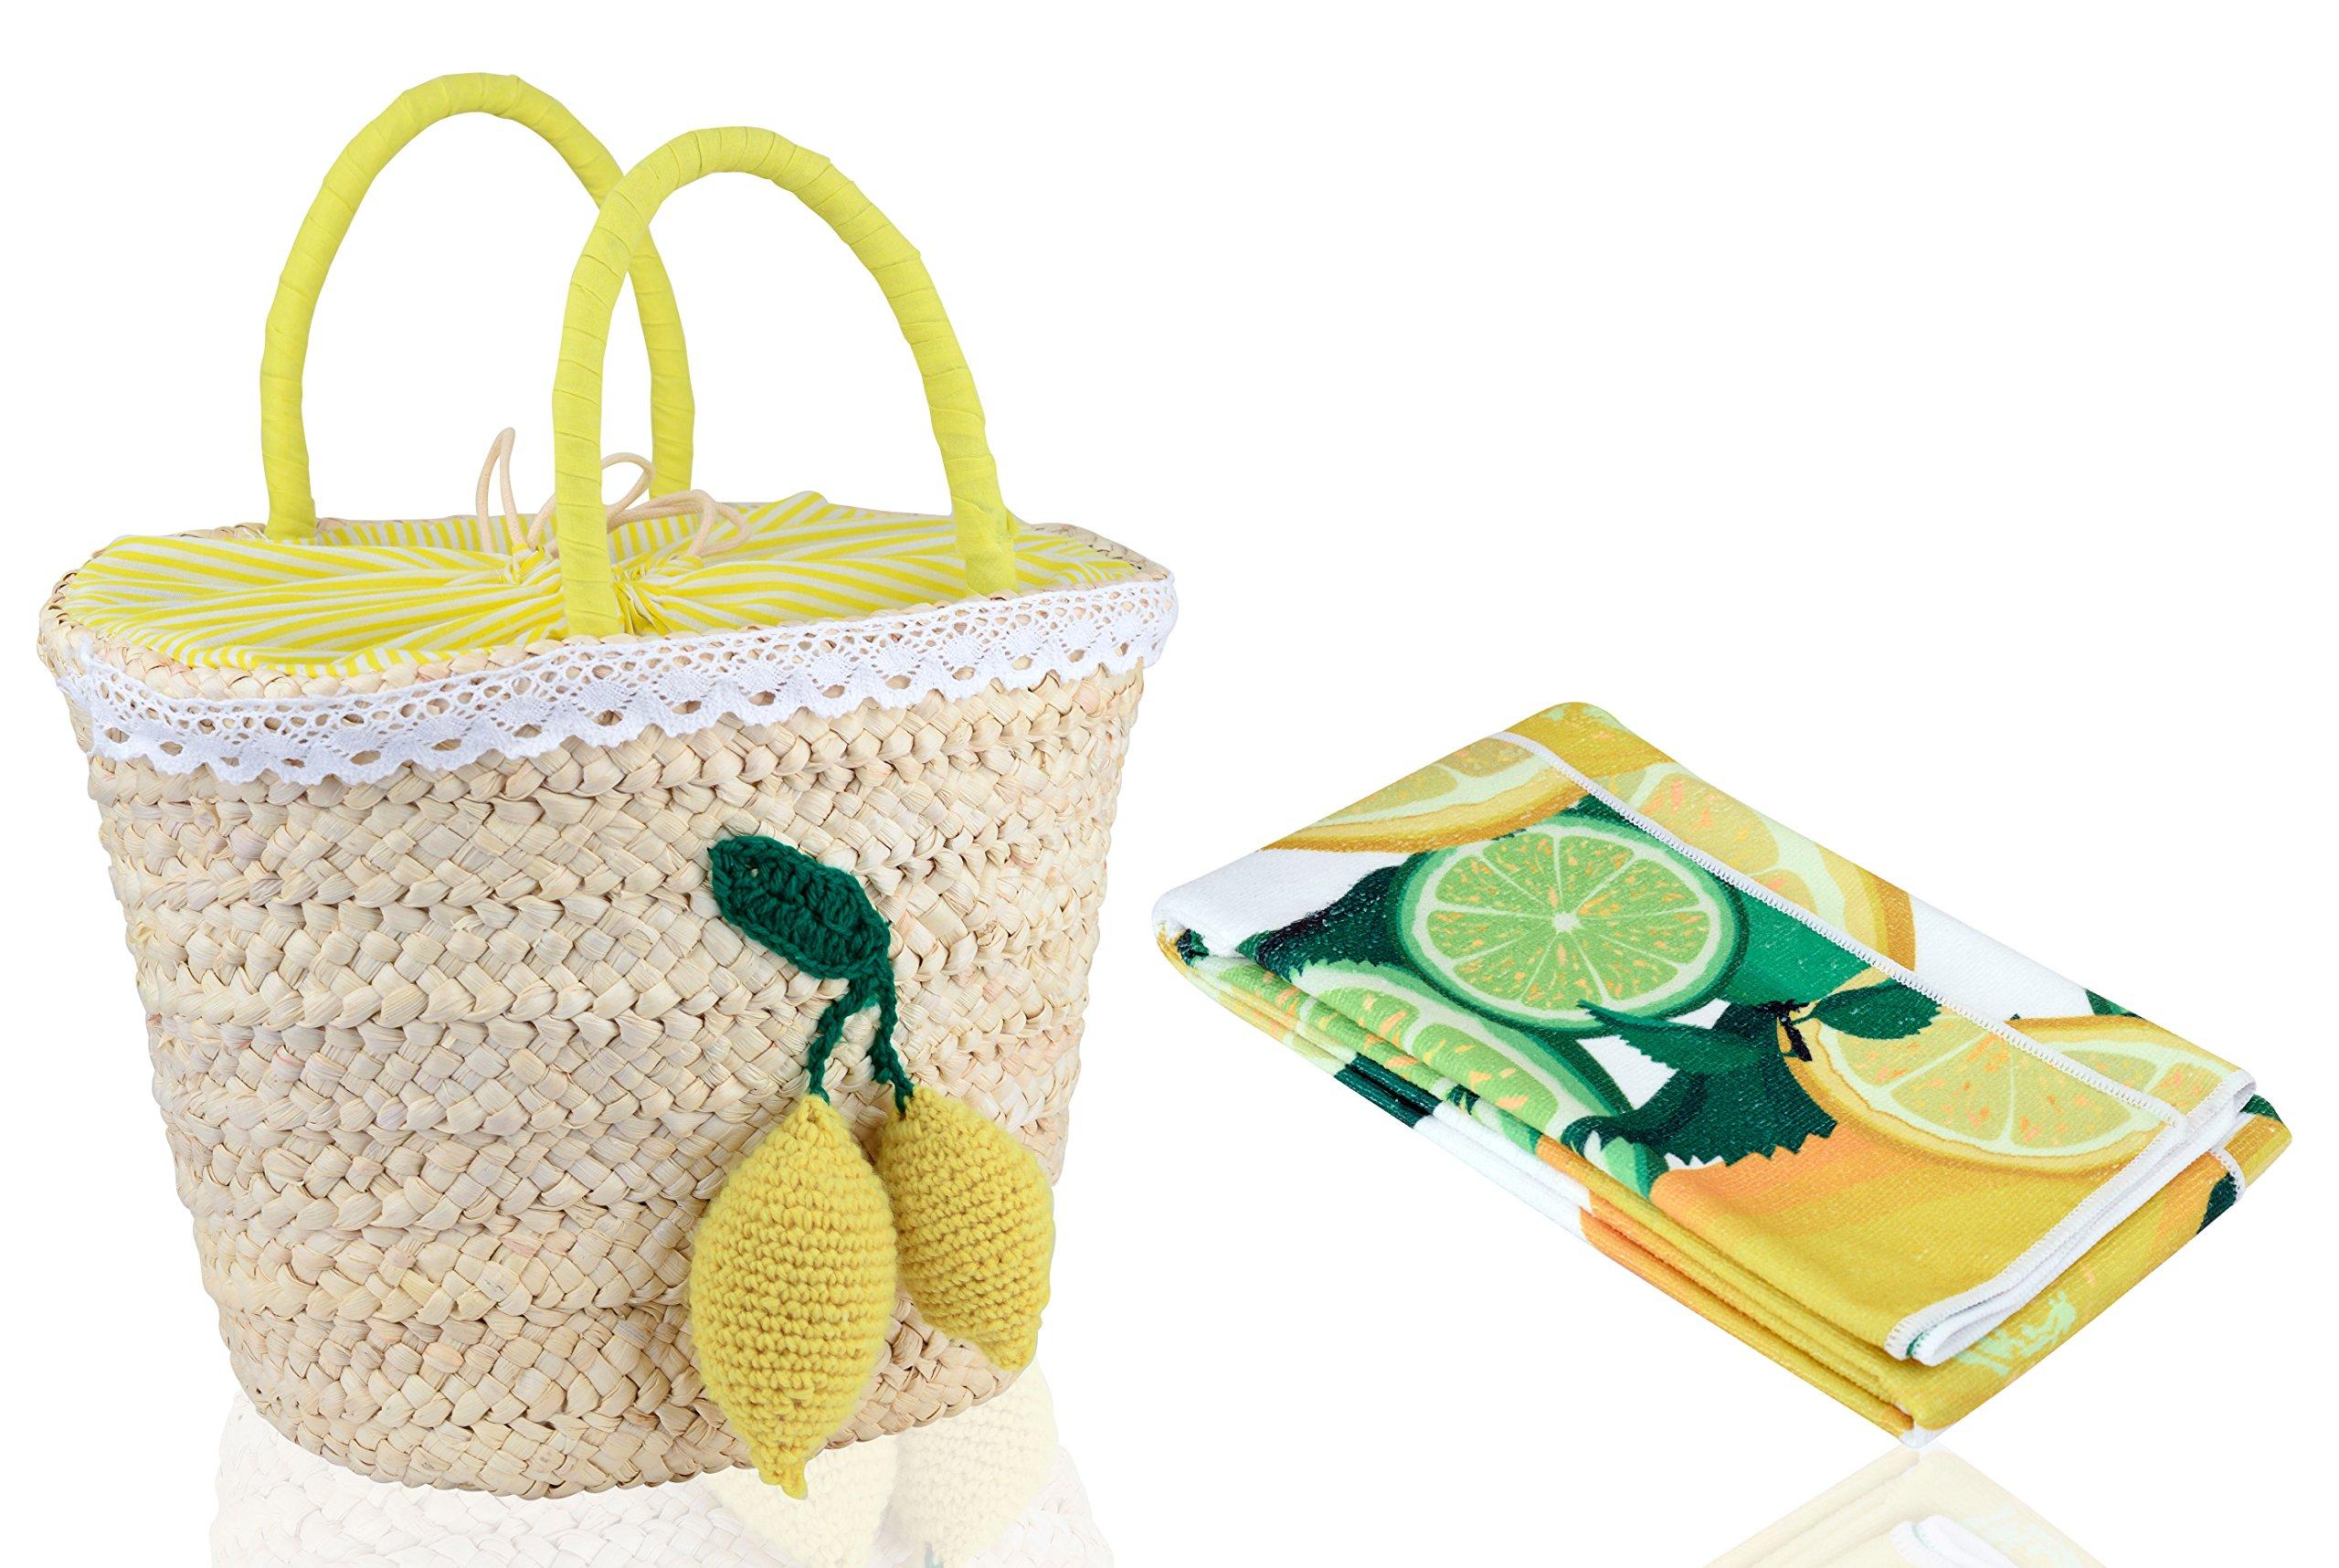 Novillia Picnic Bag Pack Of 2 Beach Towels By Handmade Straw Bag With LemonCharm